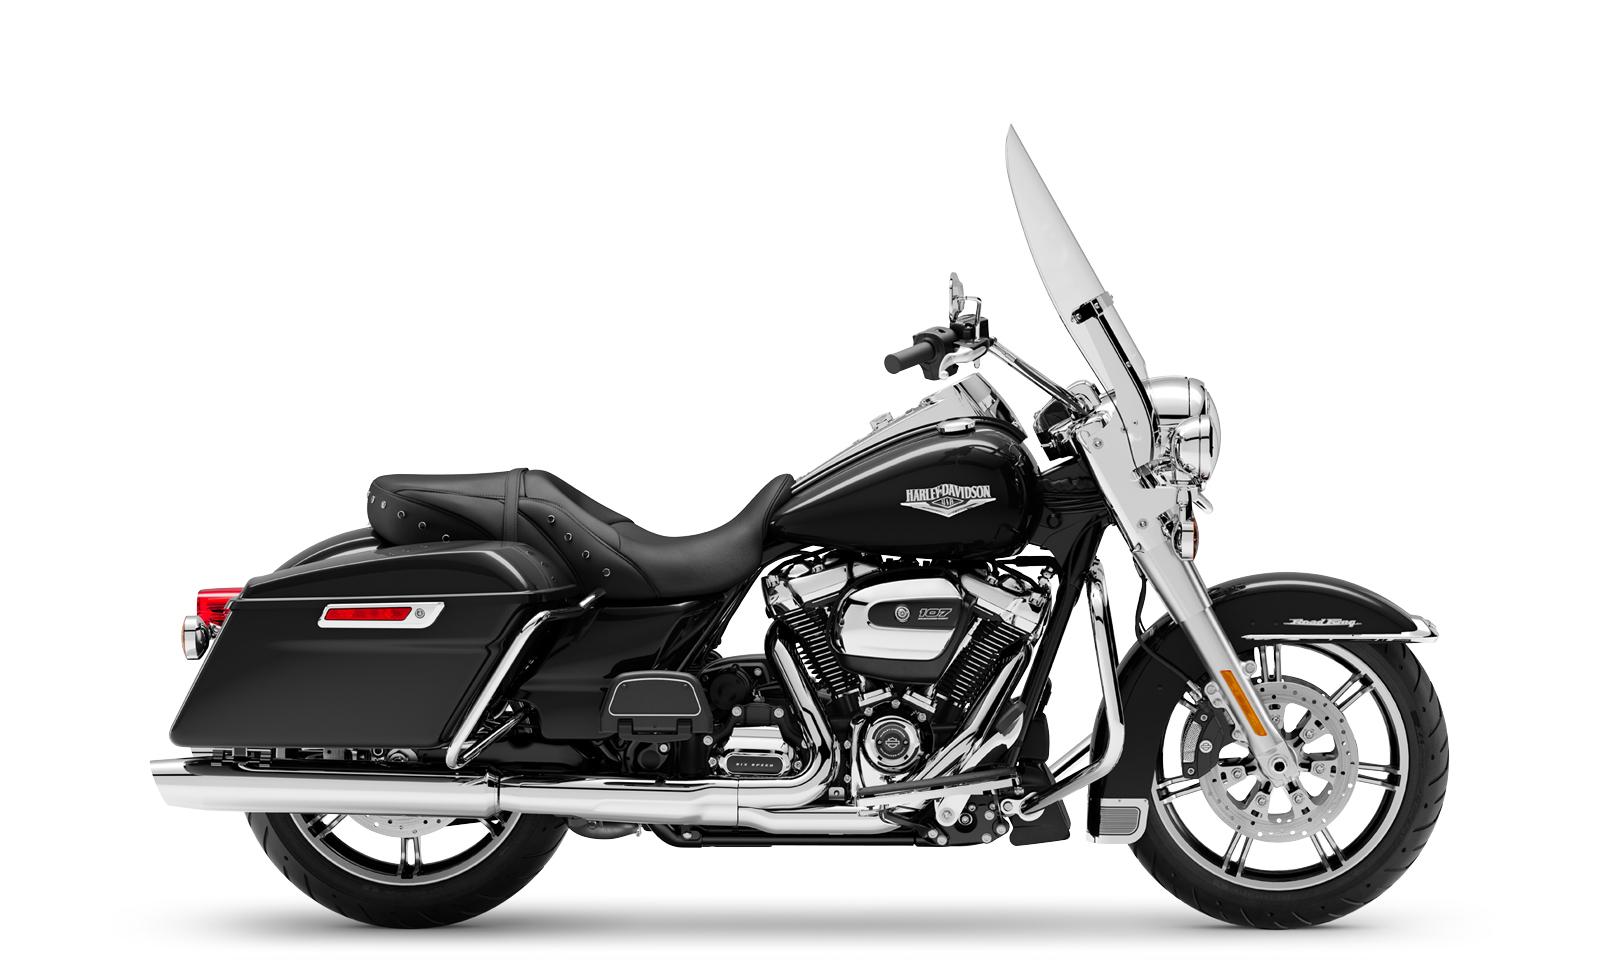 Harley Davidson Road King Price Off 60 Www Abrafiltros Org Br